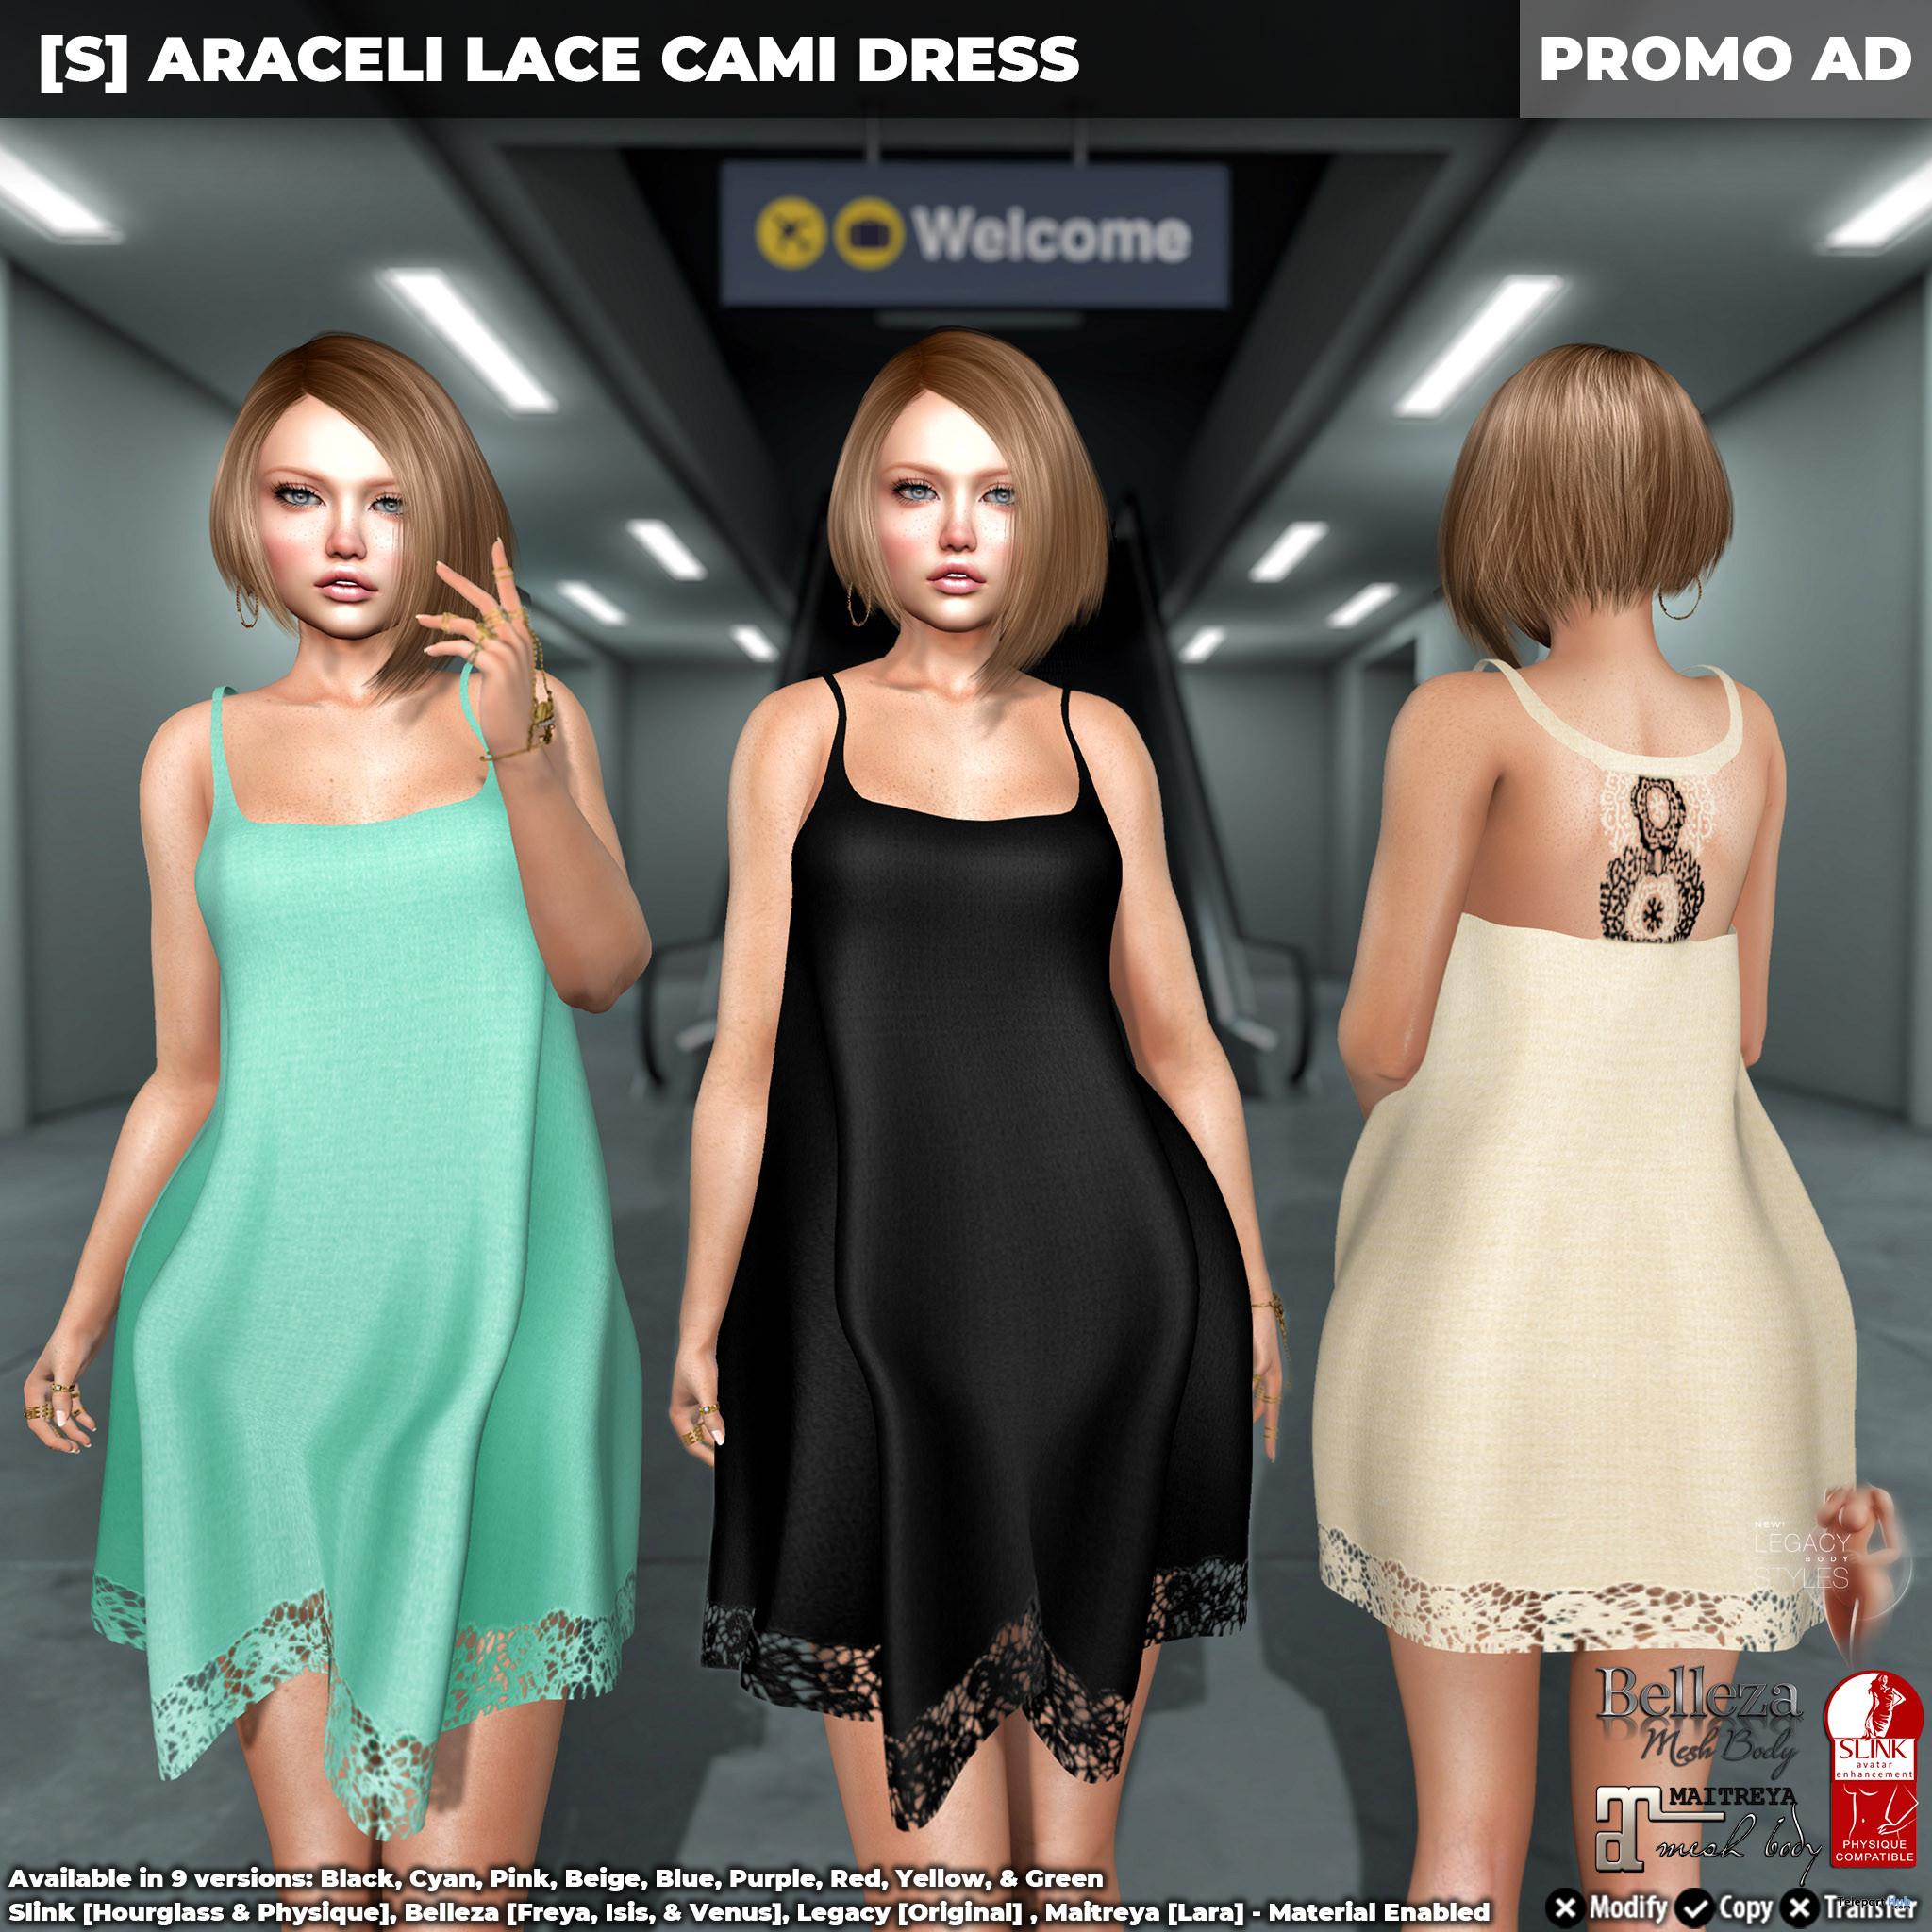 New Release: [S] Araceli Lace Cami Dress by [satus Inc] - Teleport Hub - teleporthub.com